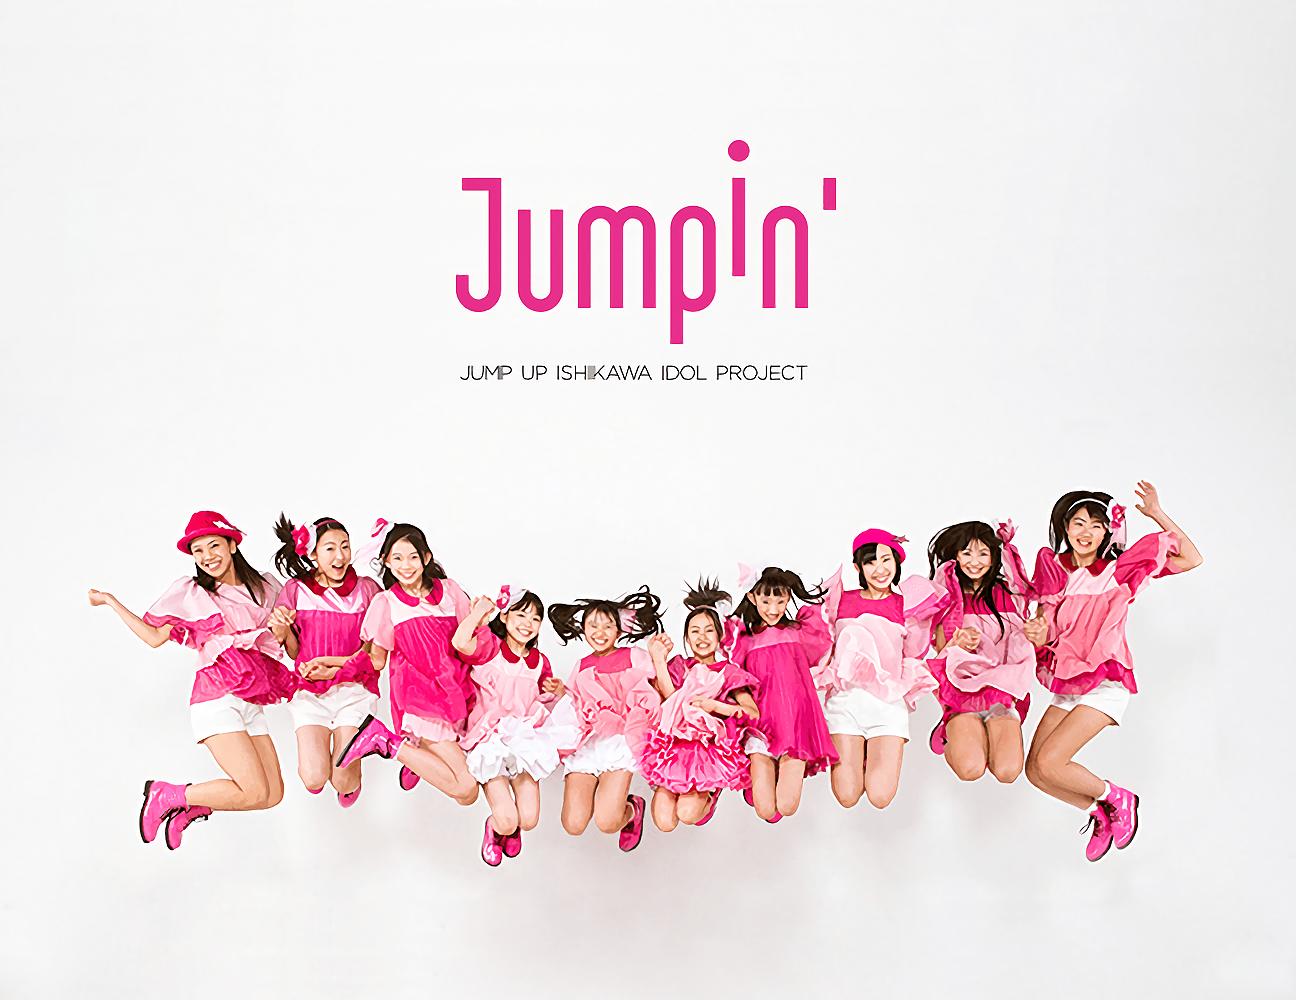 Jumpin'(ジャンピン)